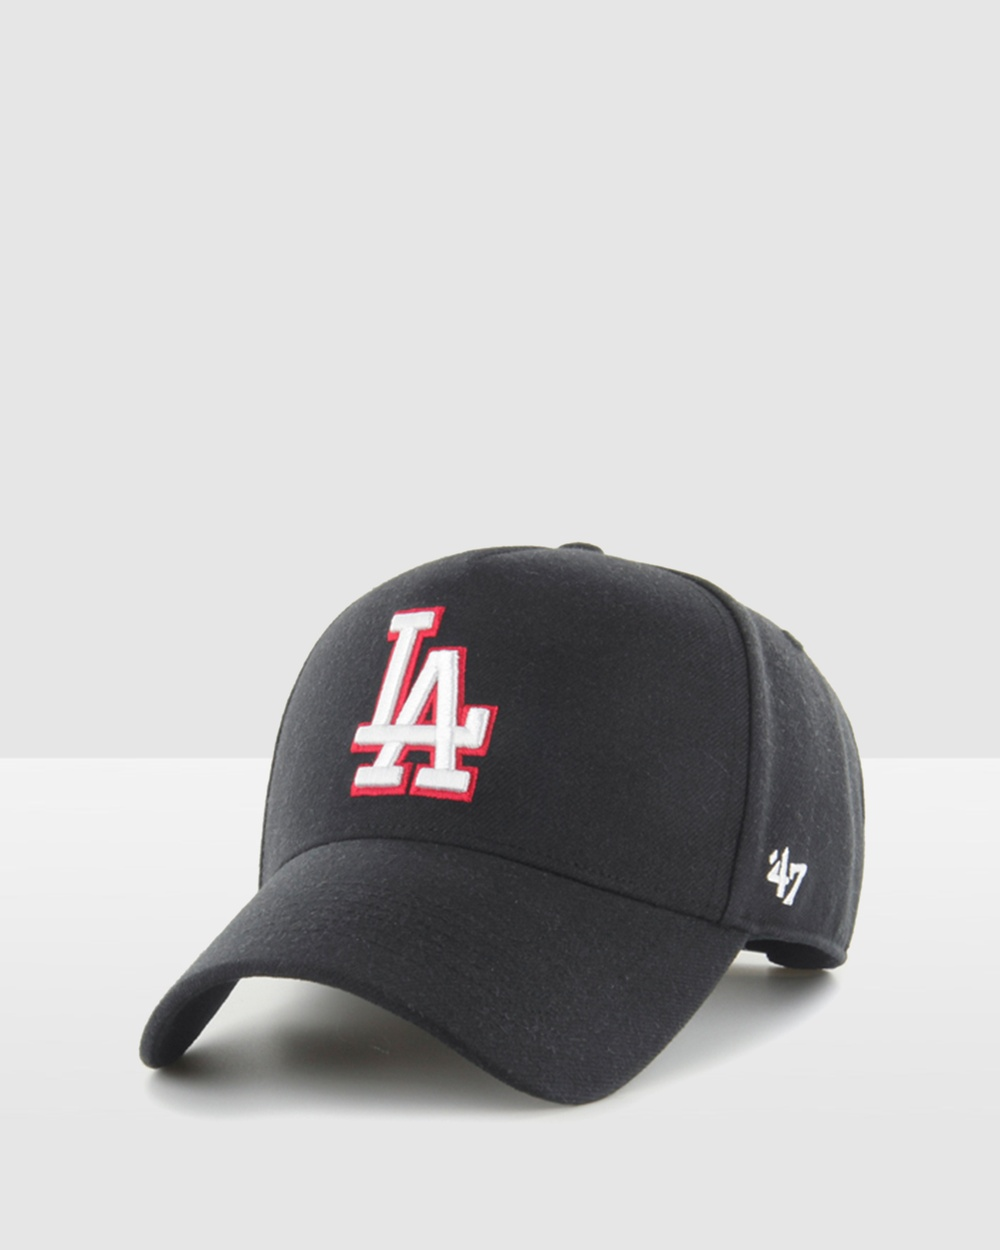 47 Los Angeles Dodgers Black Replica '47 MVP DT Snapback Headwear black